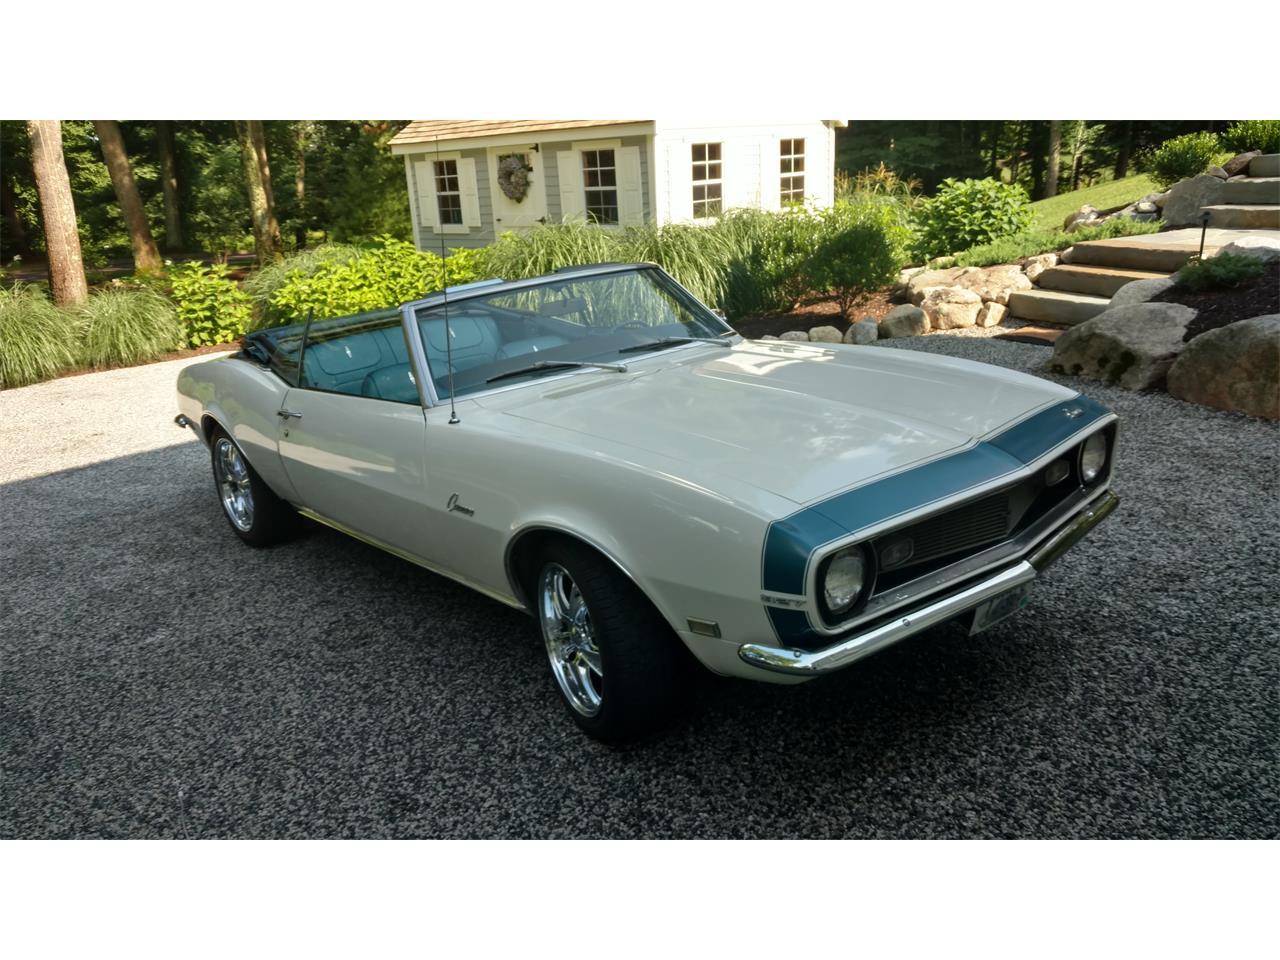 1968 Chevrolet Camaro (CC-1133200) for sale in East Greenwich, Rhode Island